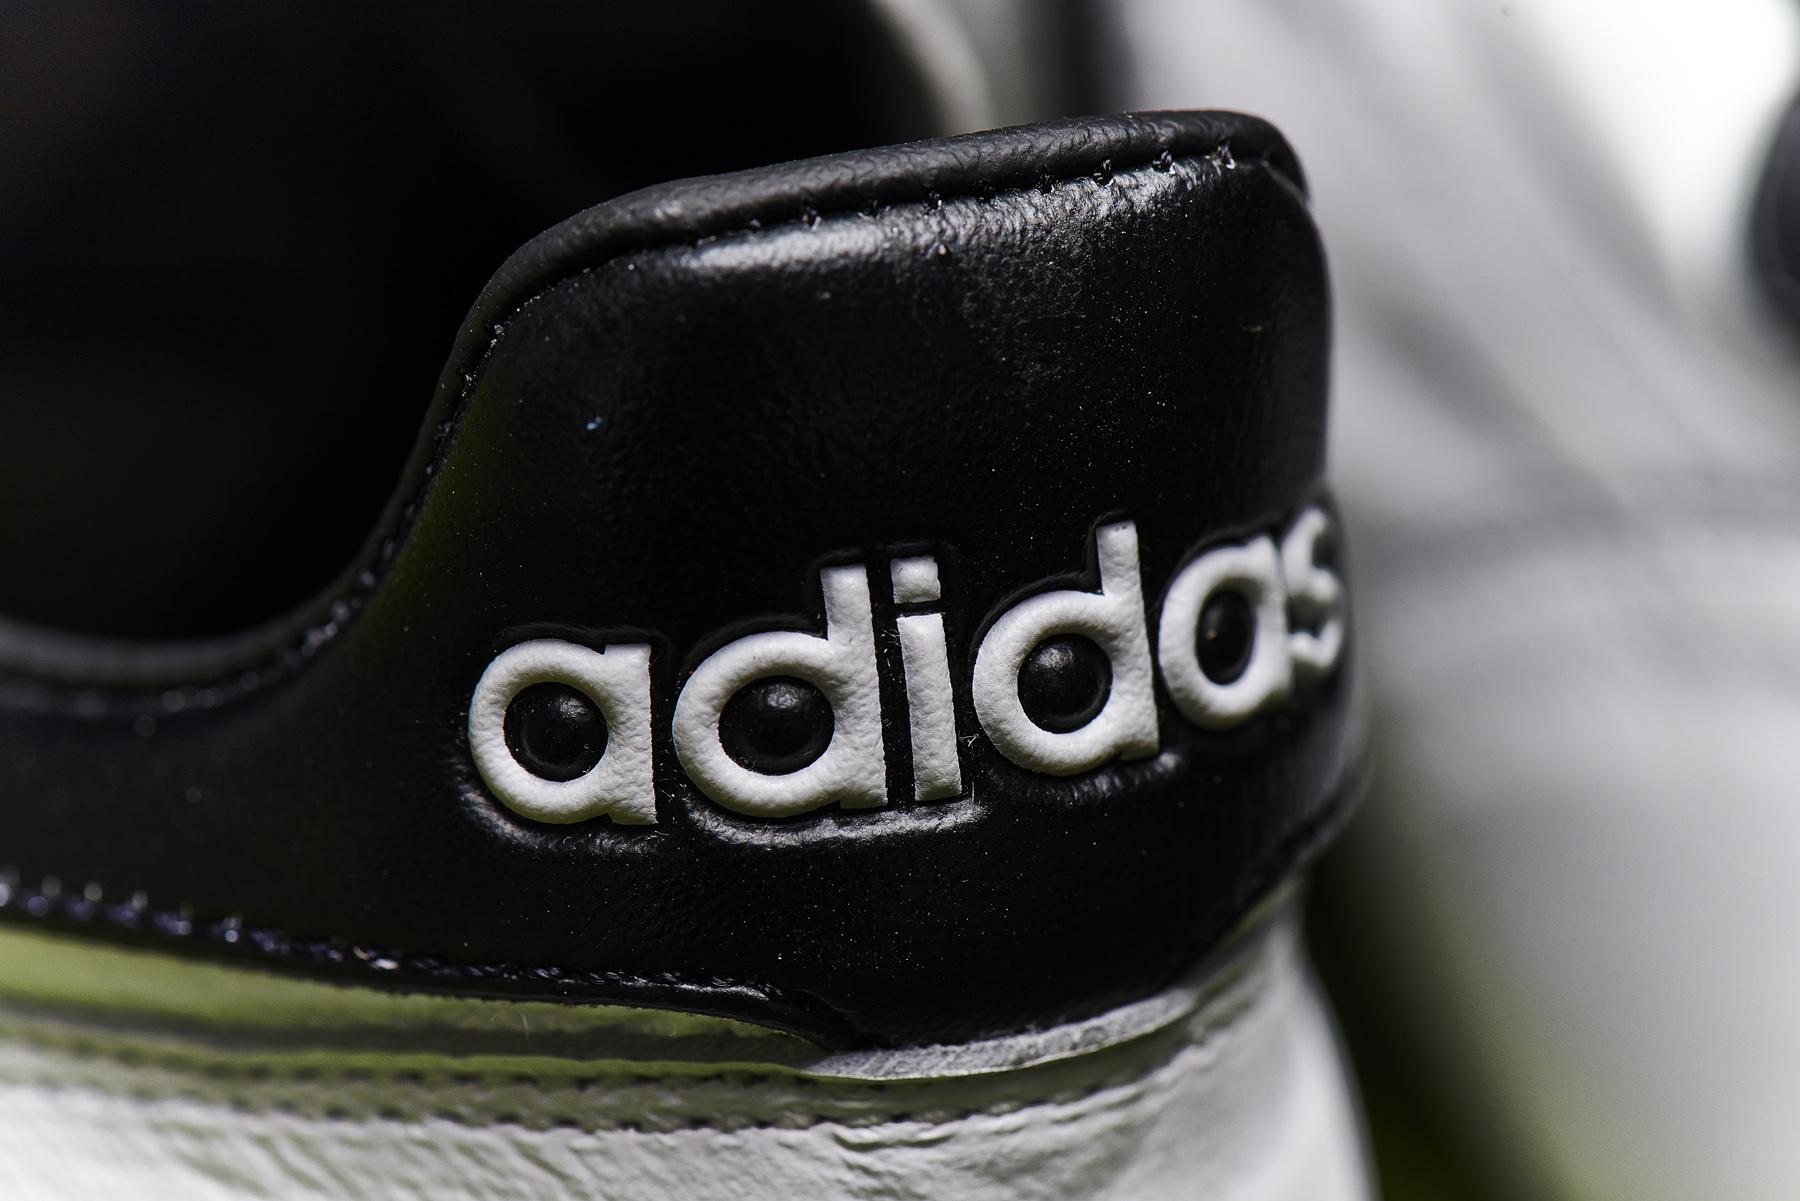 AJS_Adidas_Copa Mundial Pile_01_0251.jpg